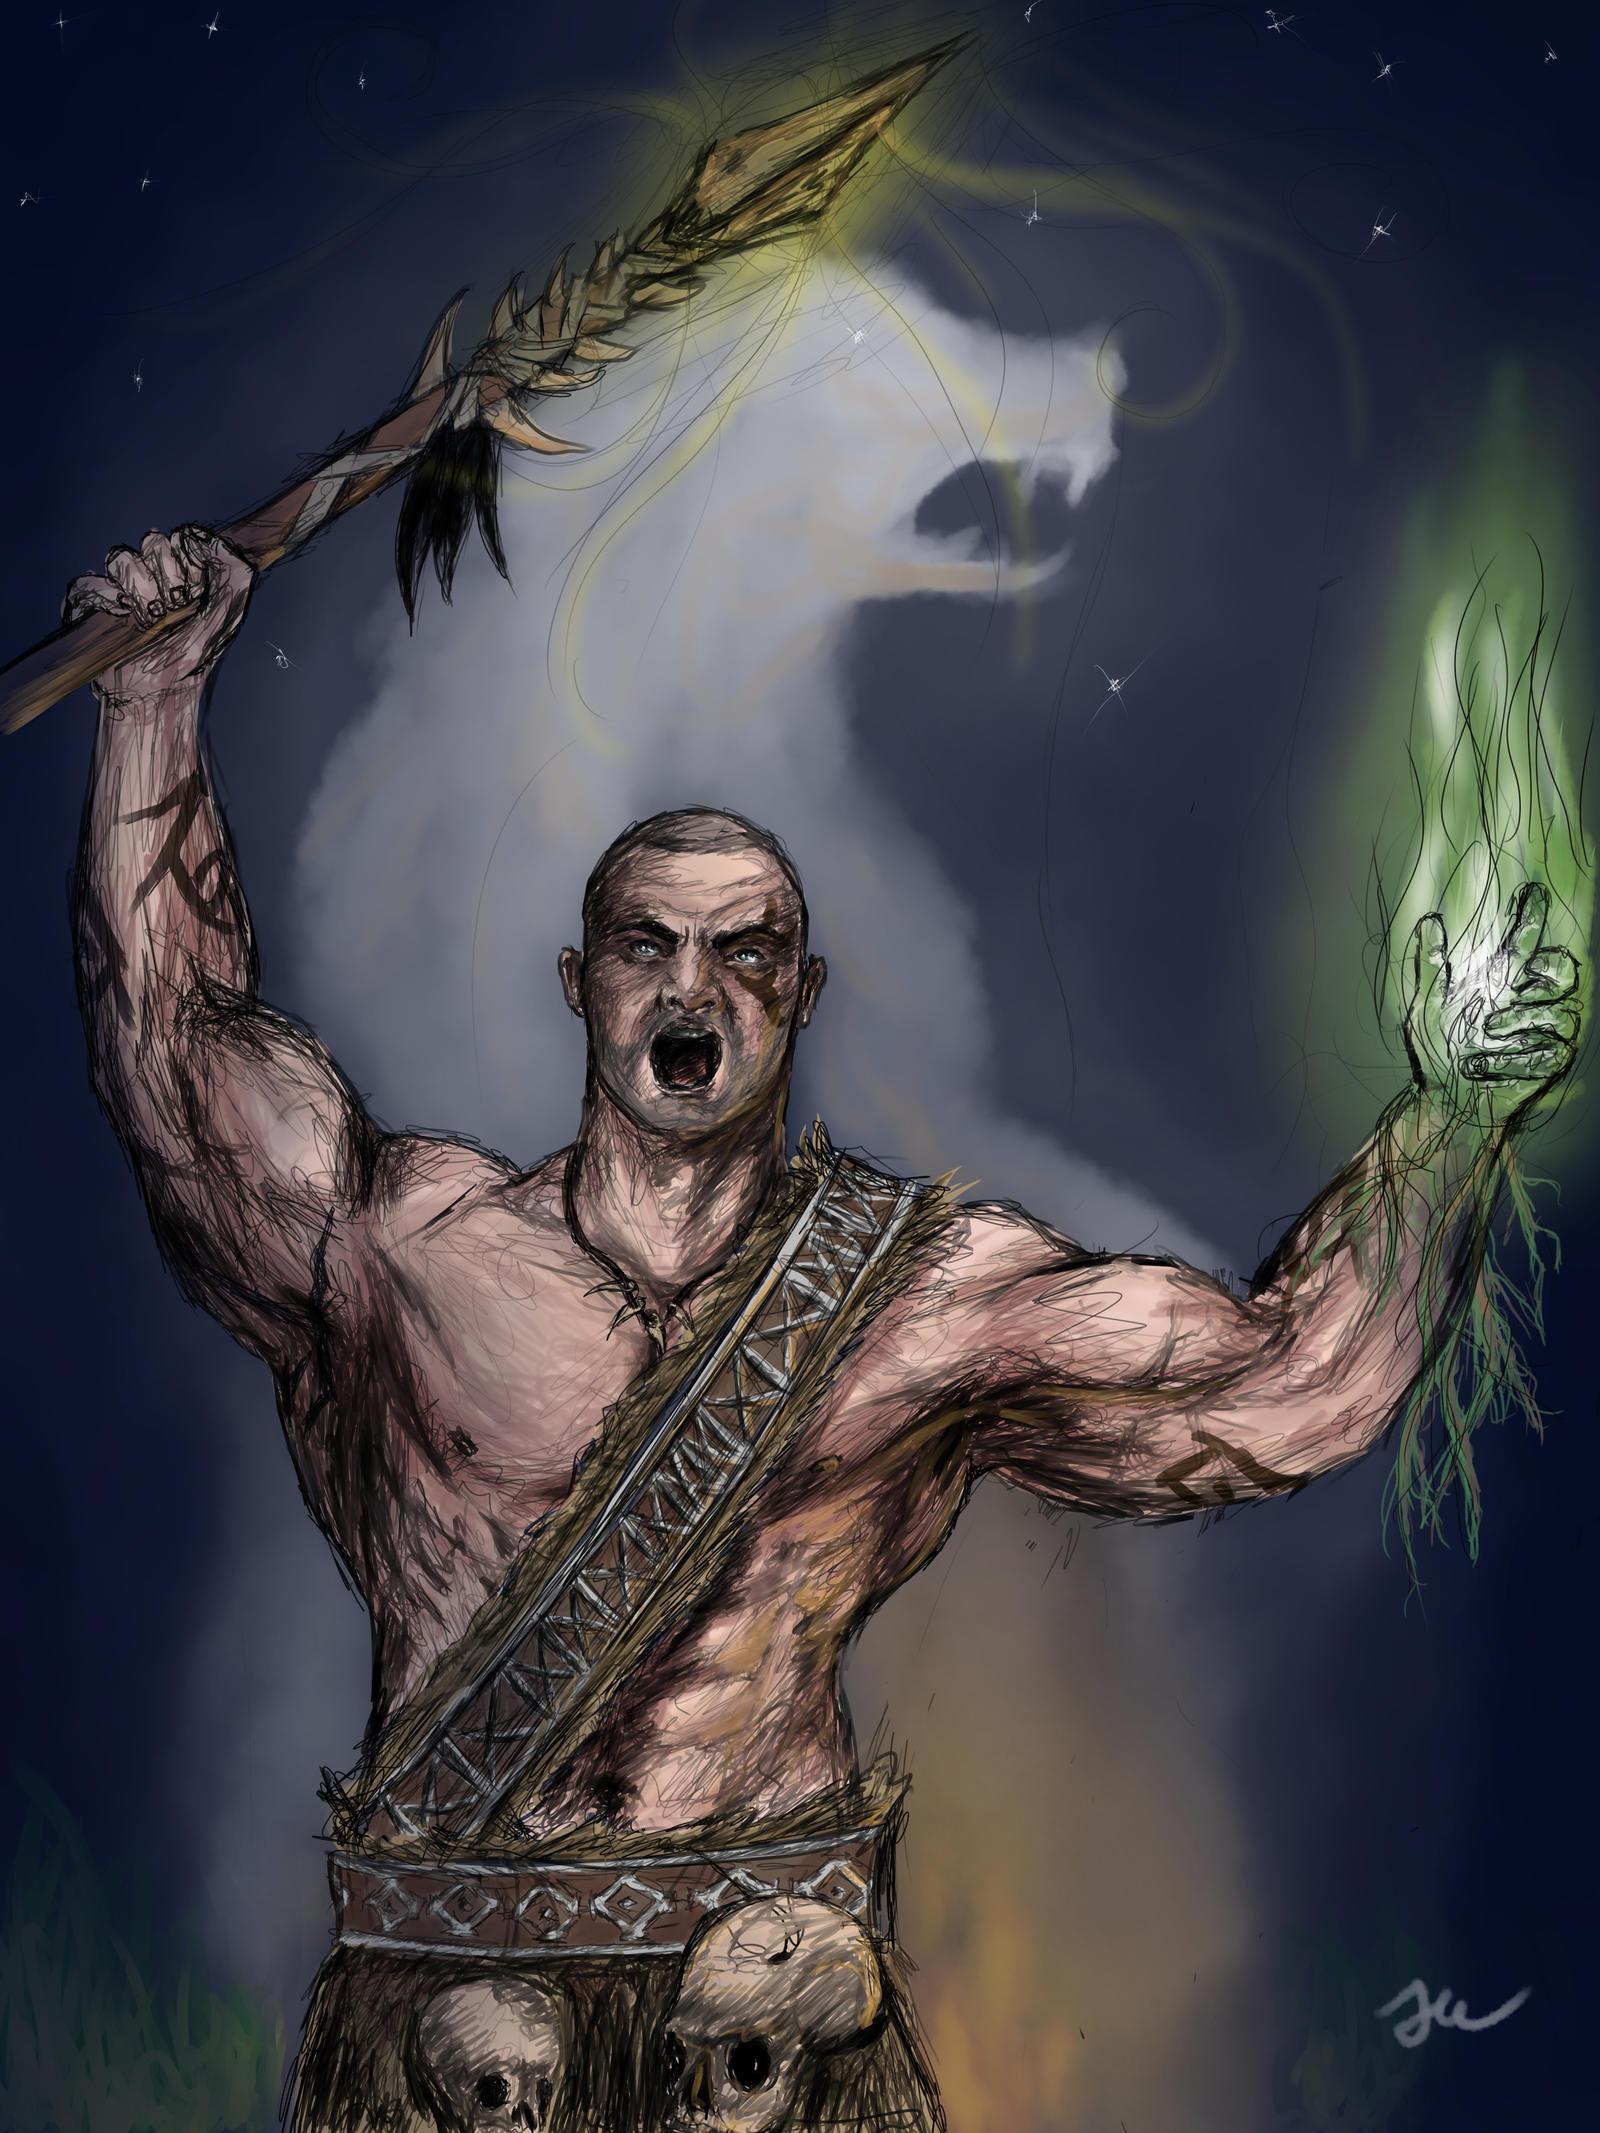 duach__a_reachman_chief_shaman_by_johnathanwardin-dci1ysn.jpg